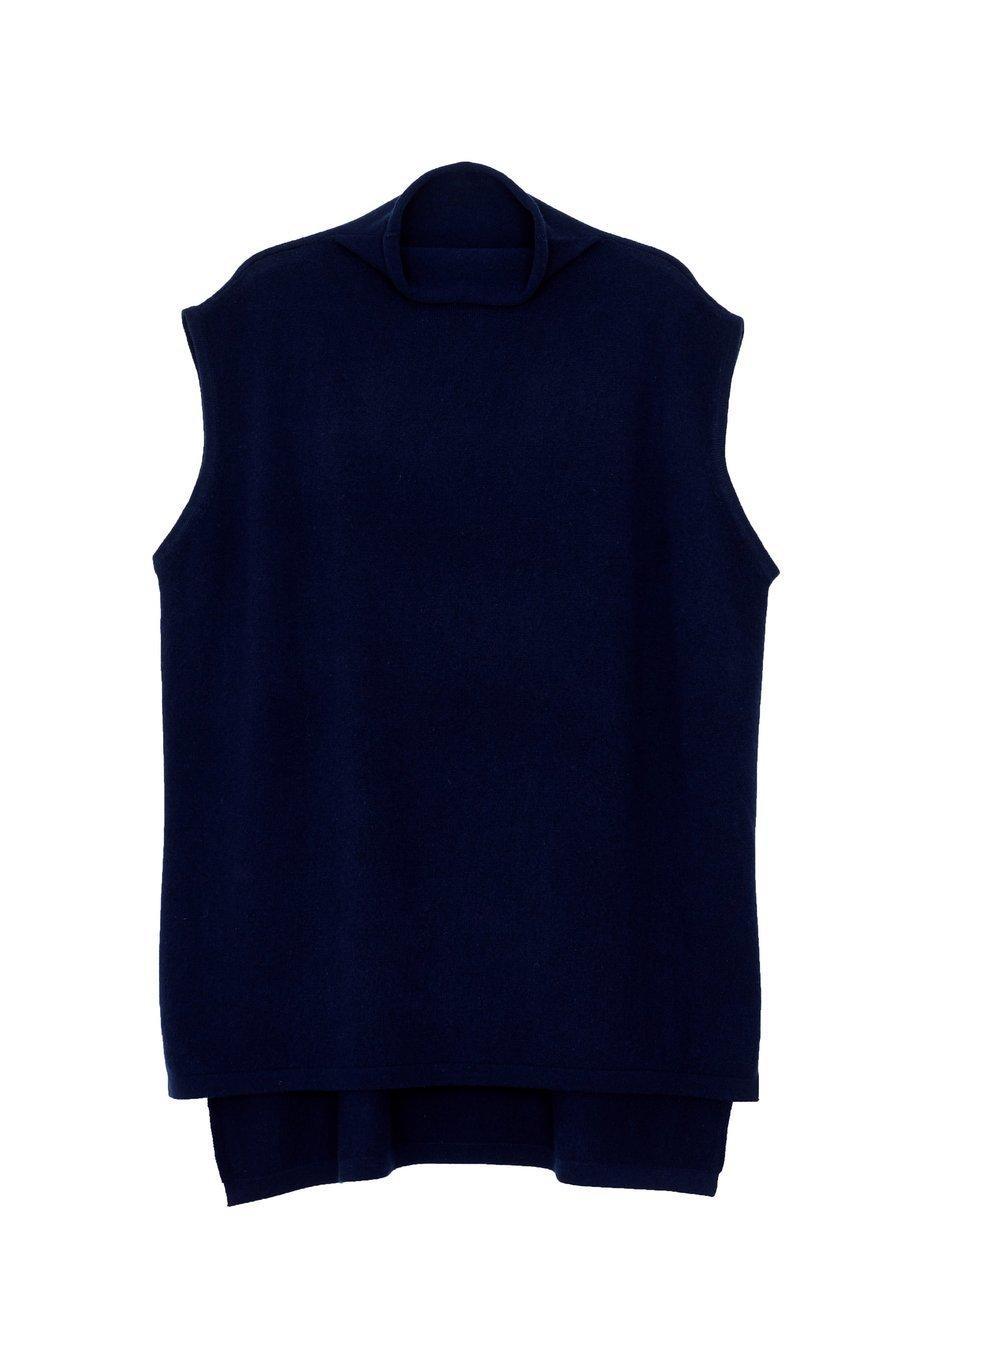 ARELA Noya Cashmere Vest In Dark Blue